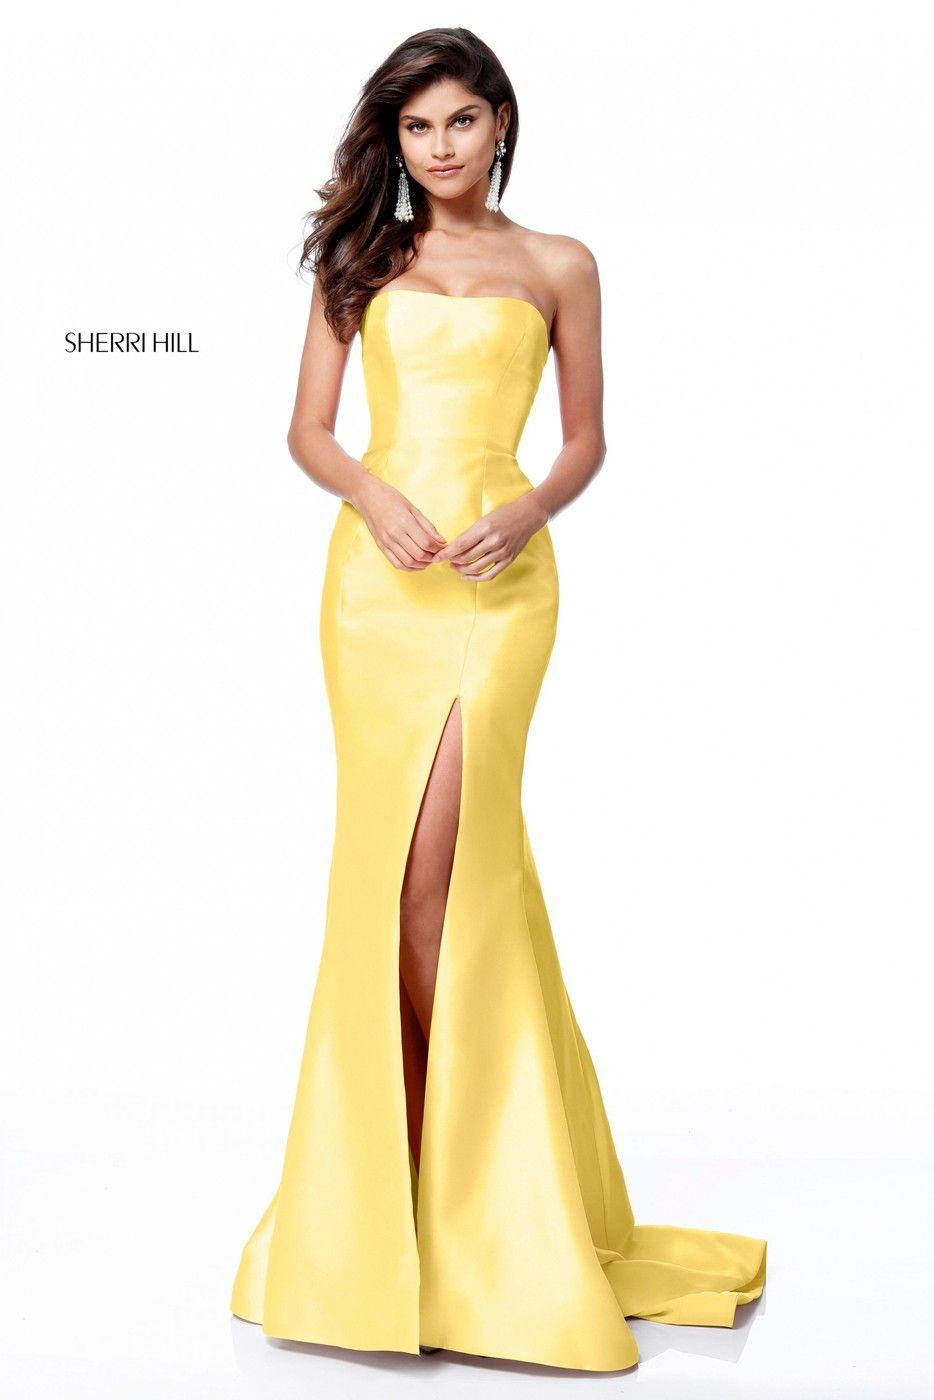 Sherri hill strapless high slit formal dress in fashion